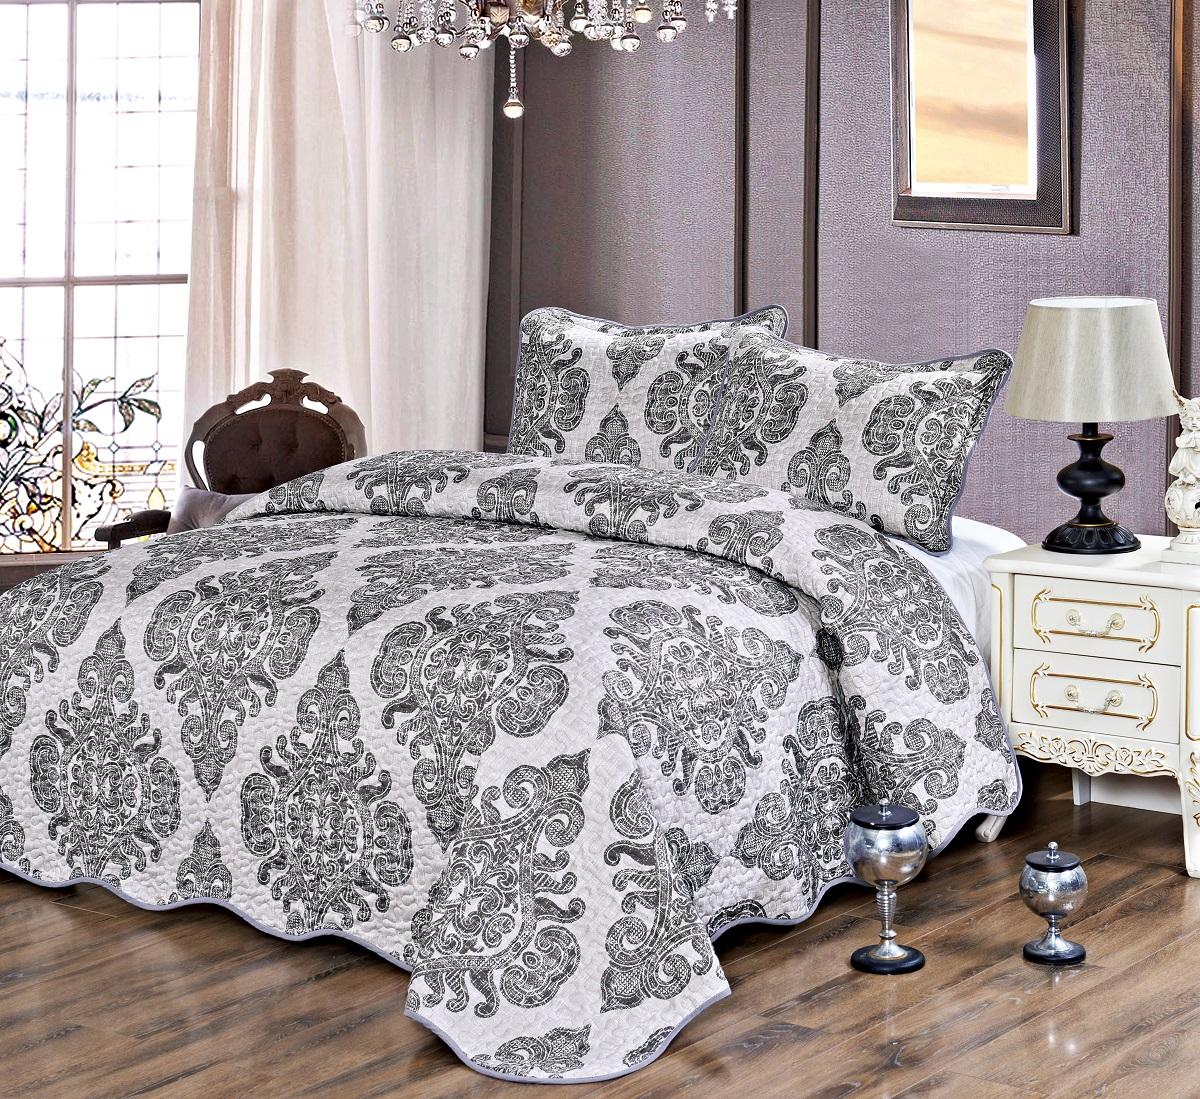 Комплект для спальни Karna Gretal: покрывало 230 х 250 см, 2 наволочки 50 х 70 см, цвет: damask6000